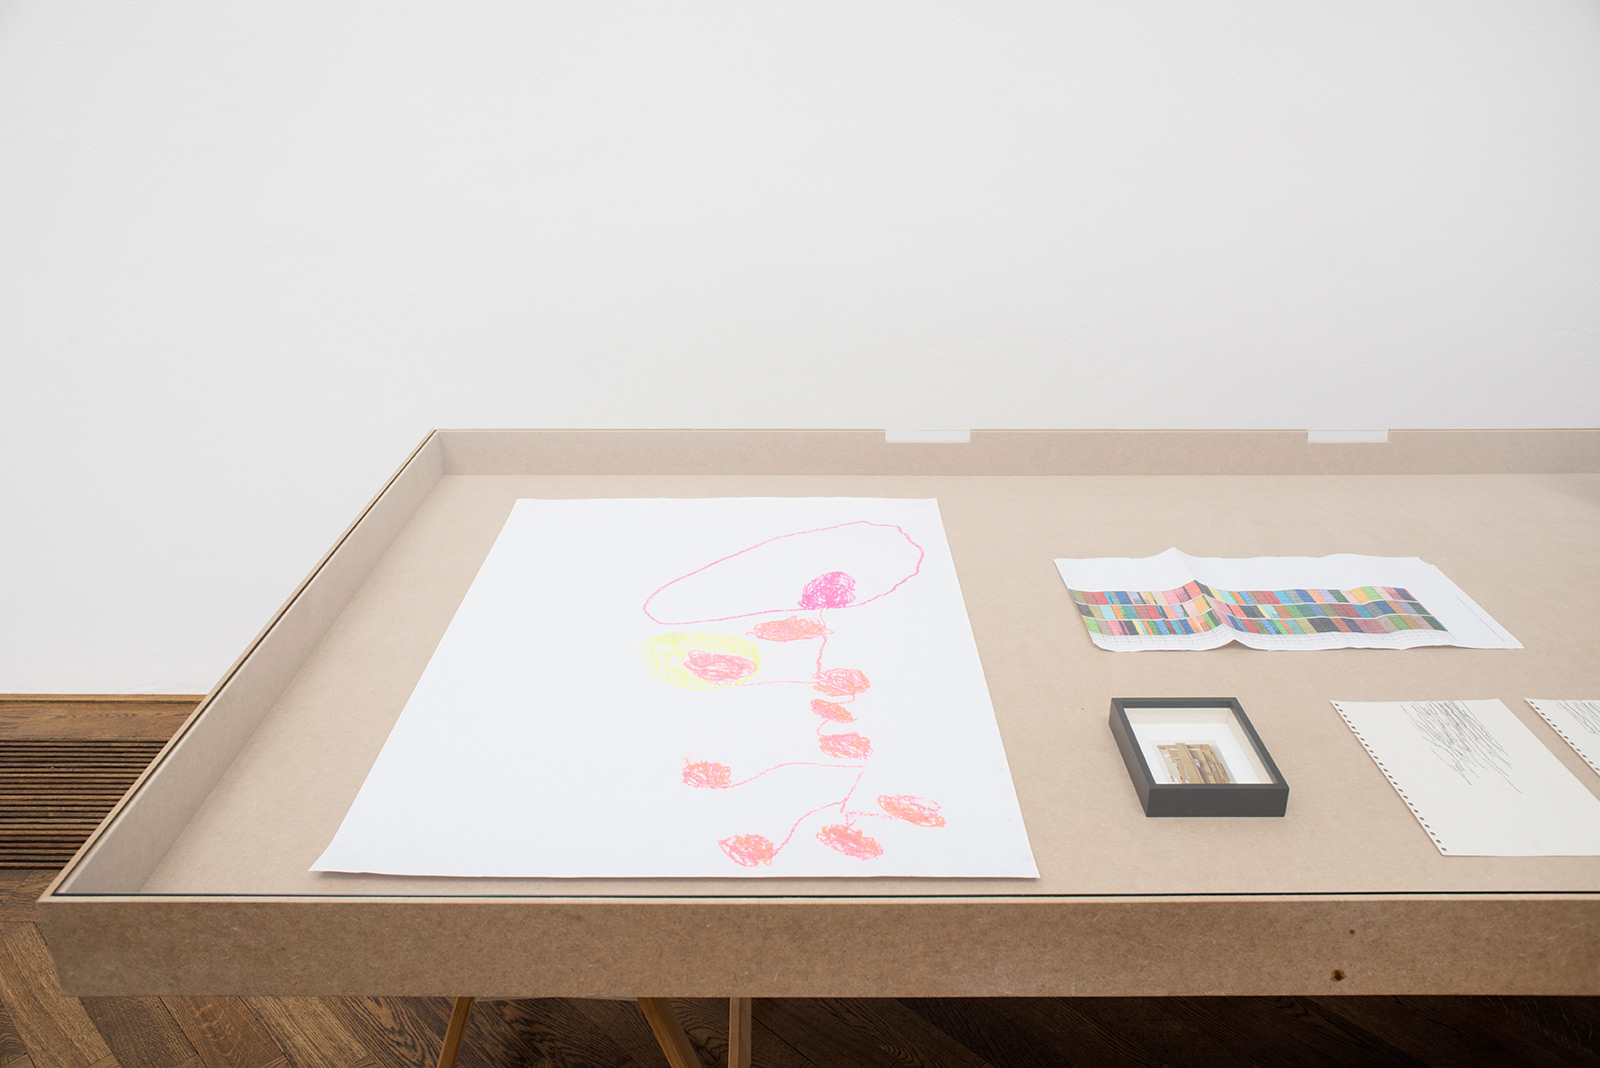 Lara Gysi «Bedürfniskolonie» | Institut Kunst, Master 2016,